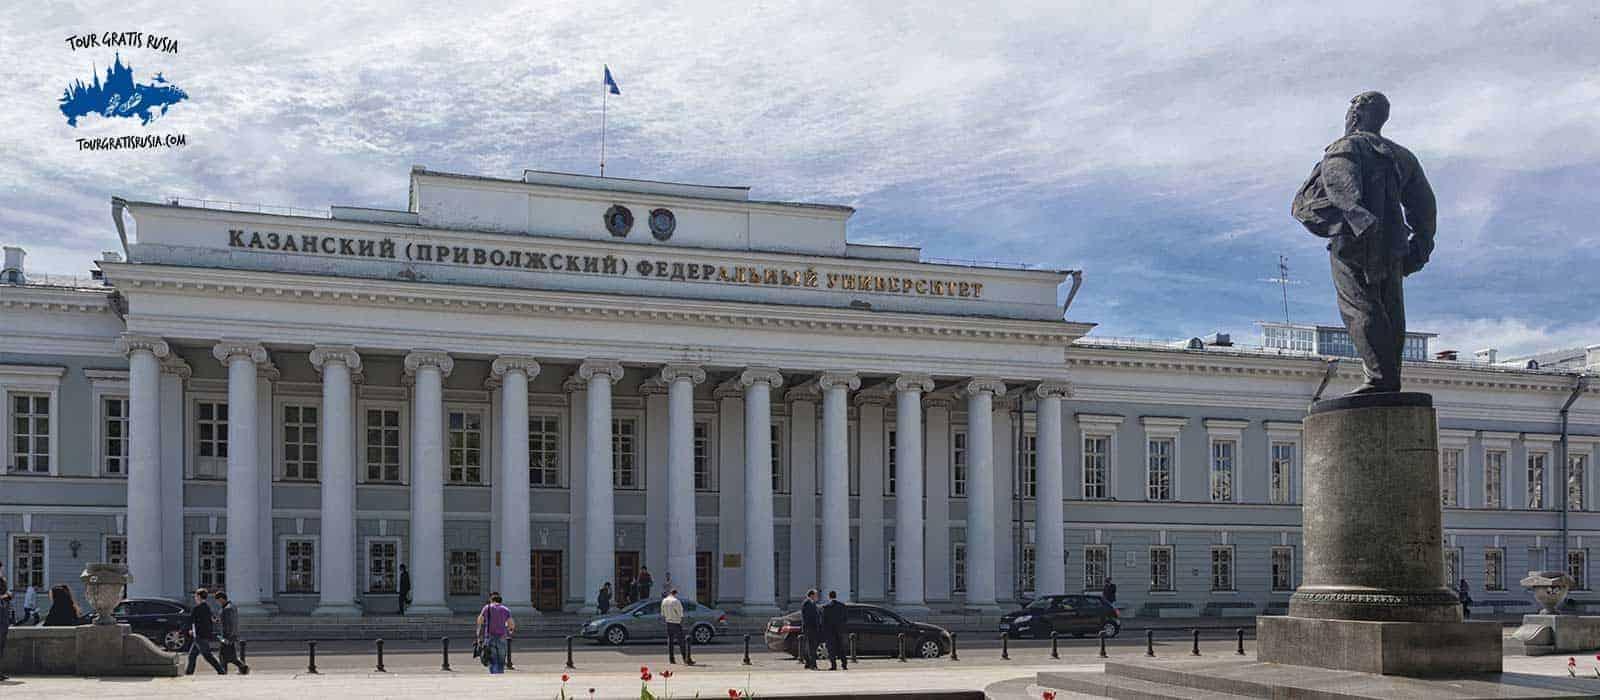 Tour Kazan cultural